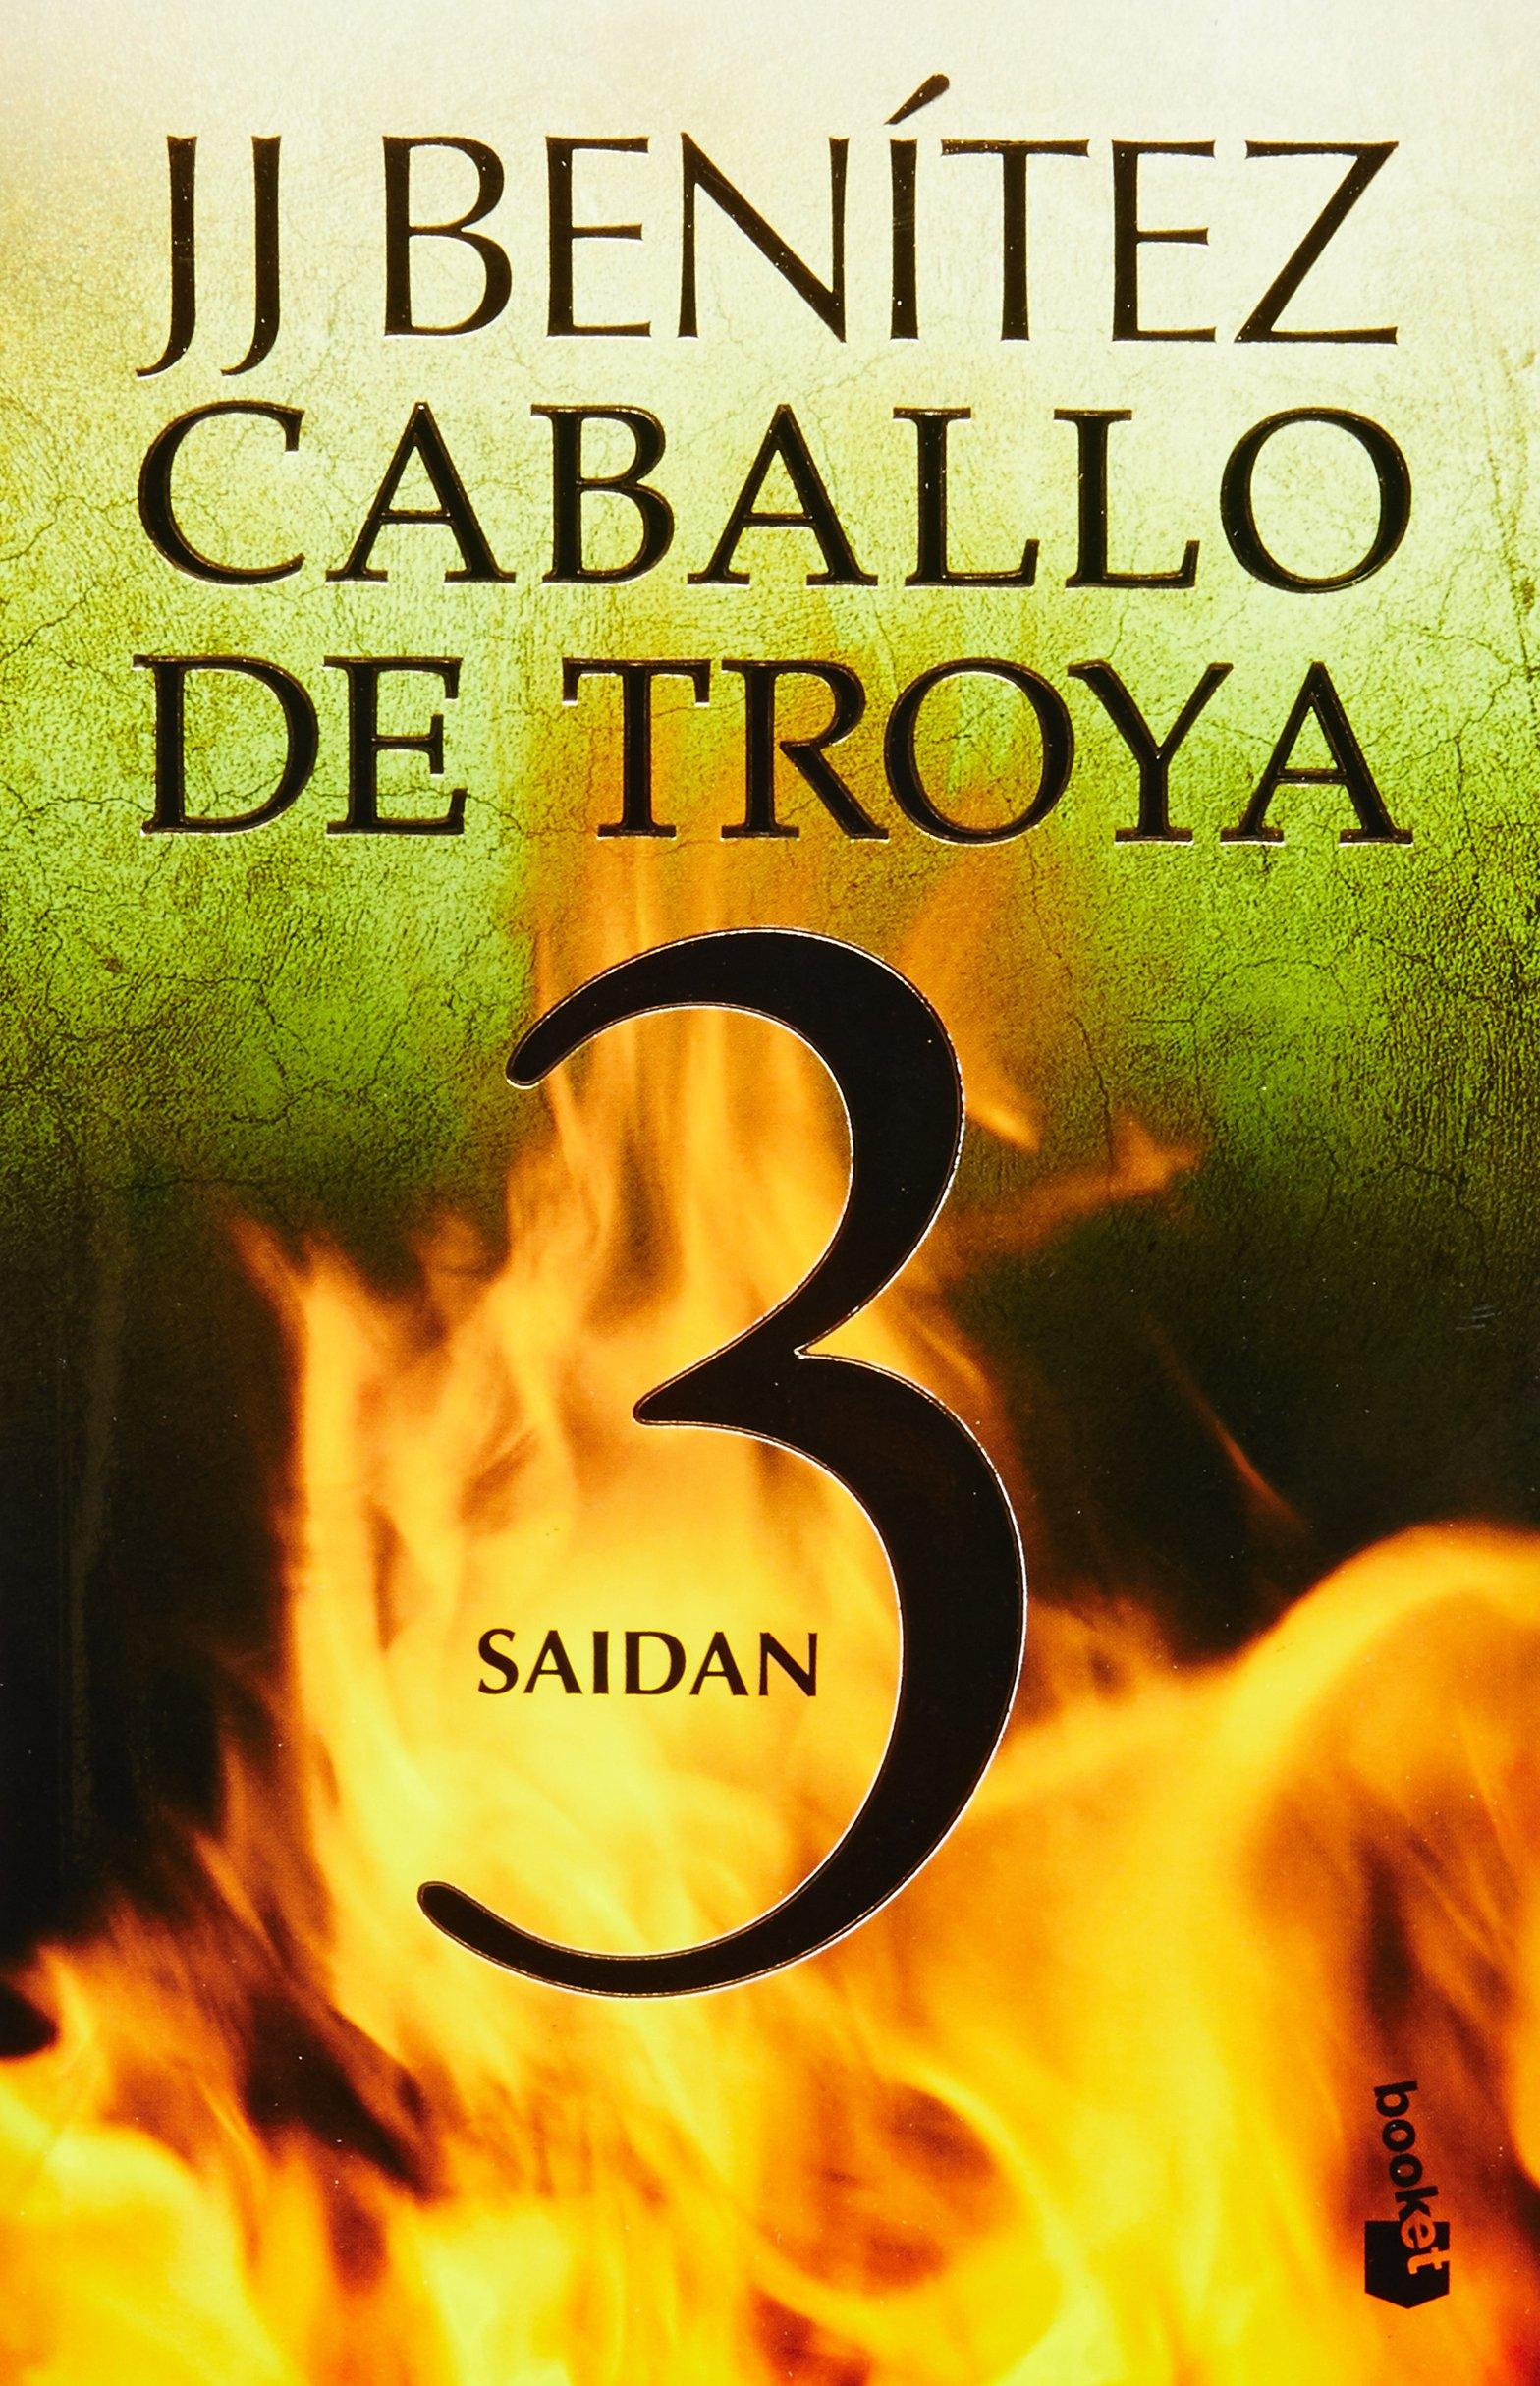 Caballo de Troya 3 (Nueva edic.): 1:J. J. Benítez: Amazon.com.mx: Libros